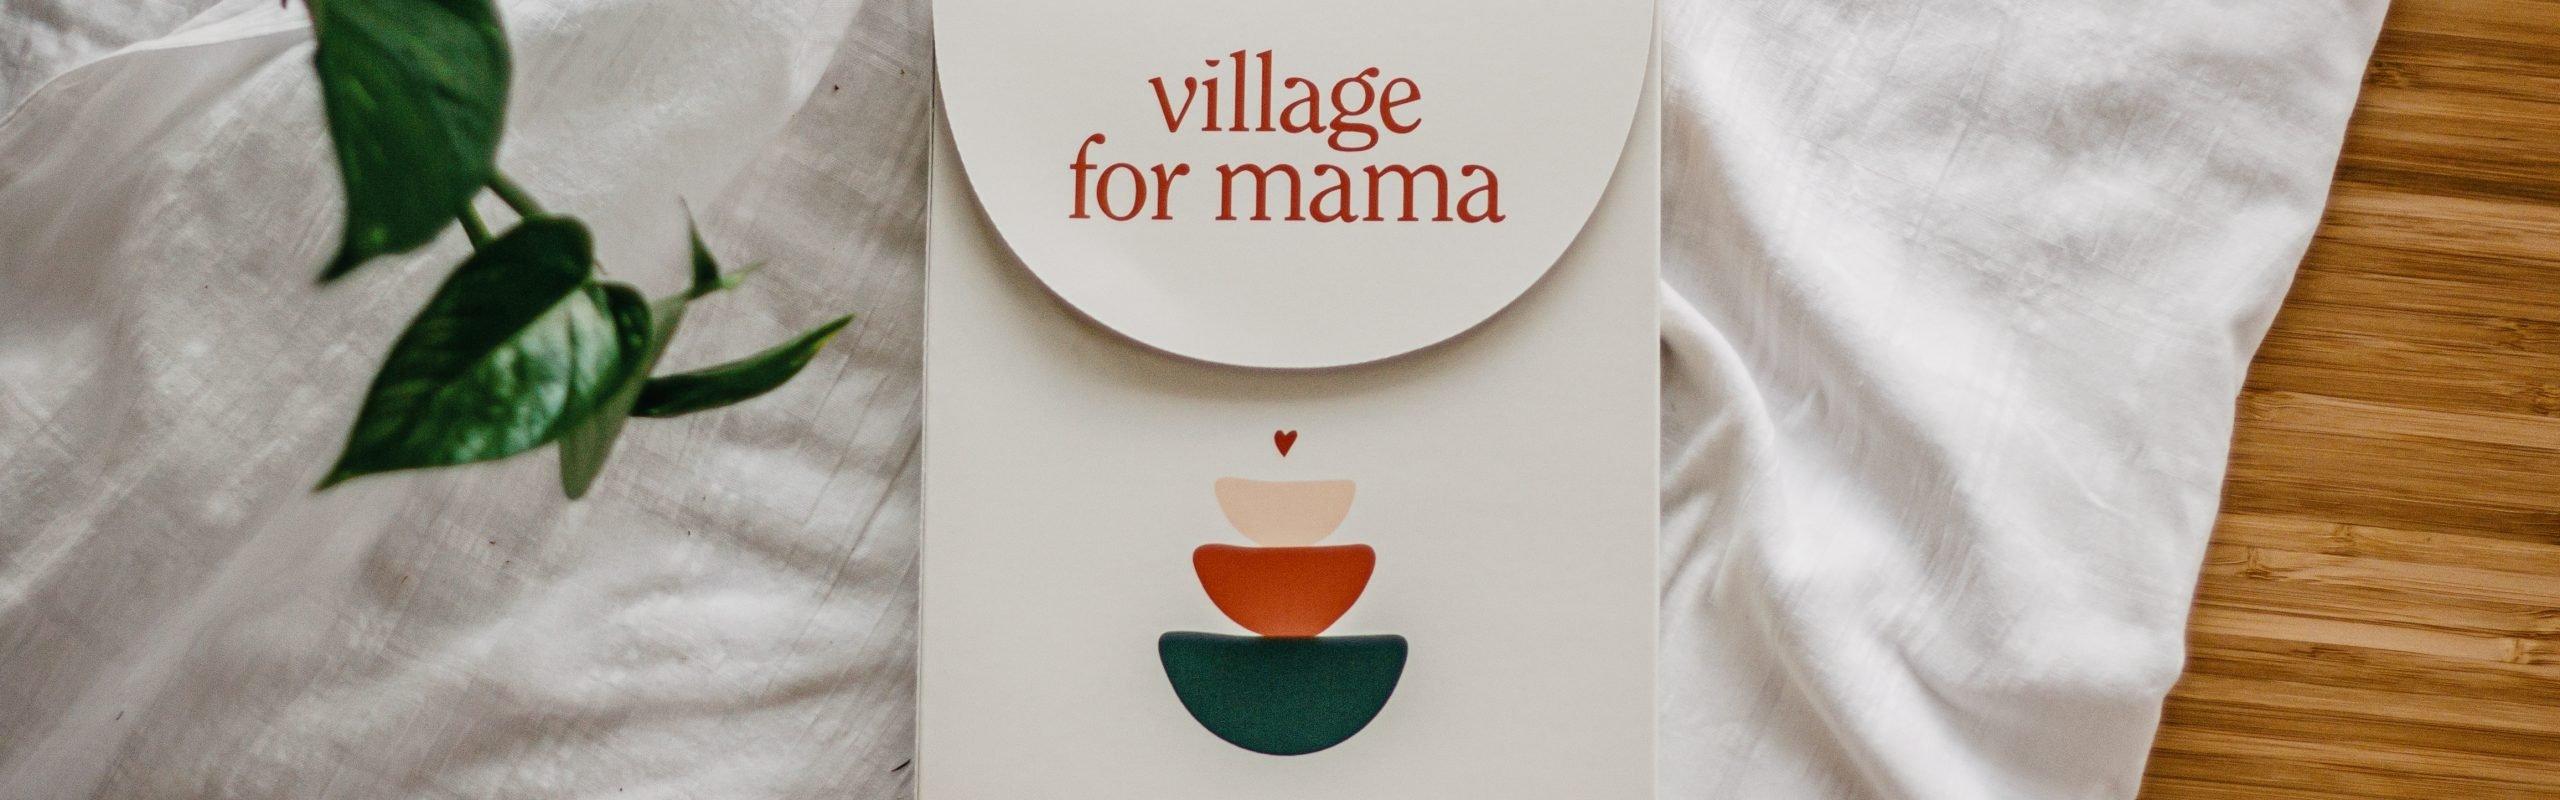 village for mama book